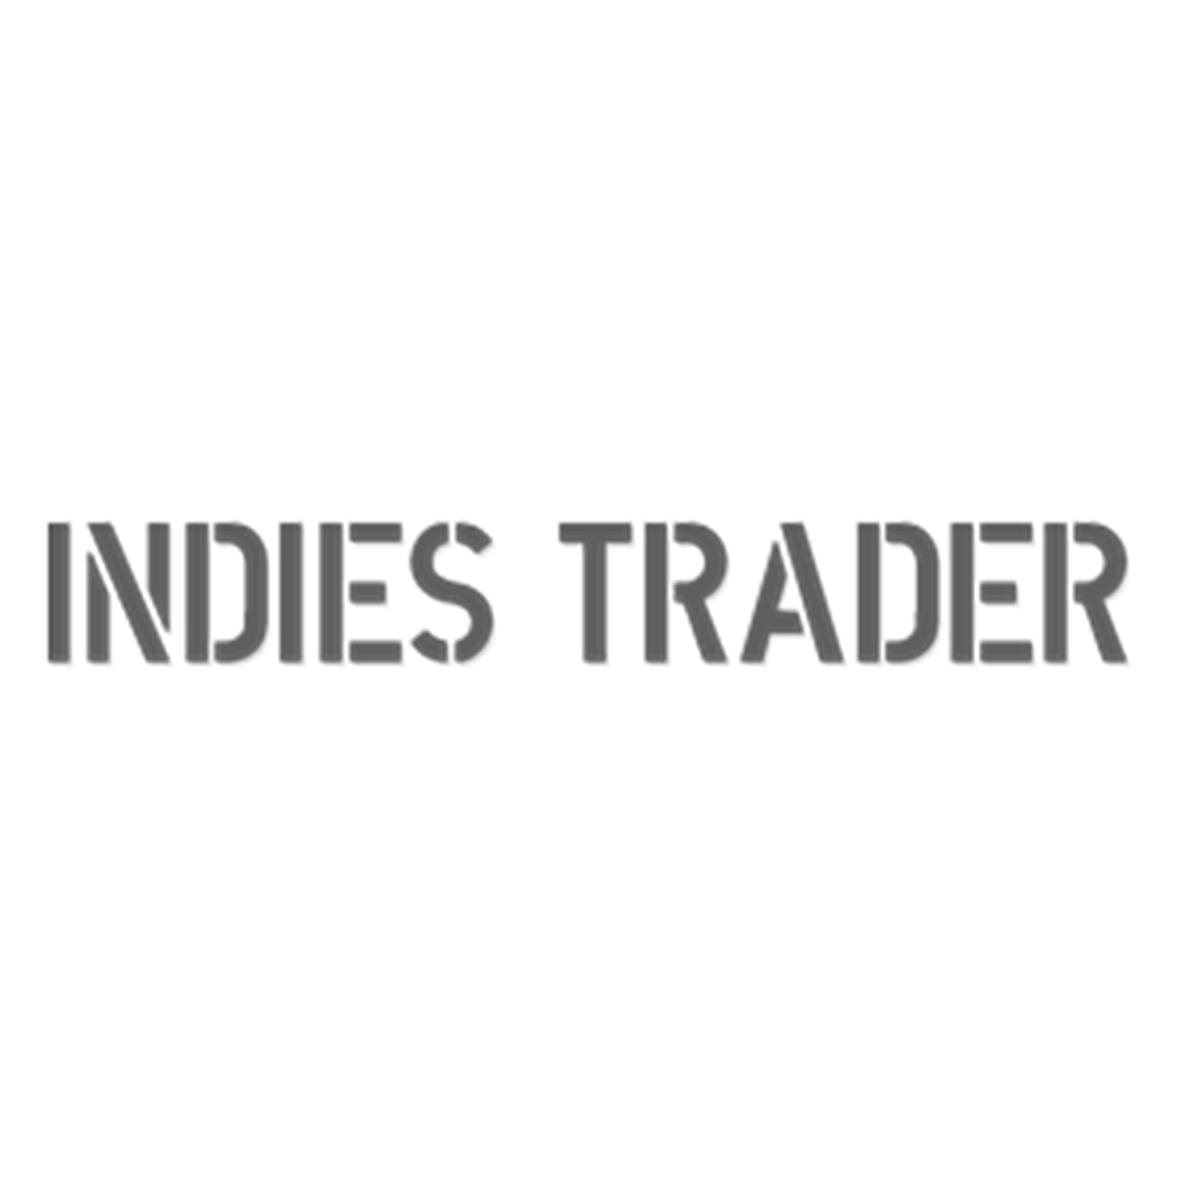 Indies Trader Logo.jpg